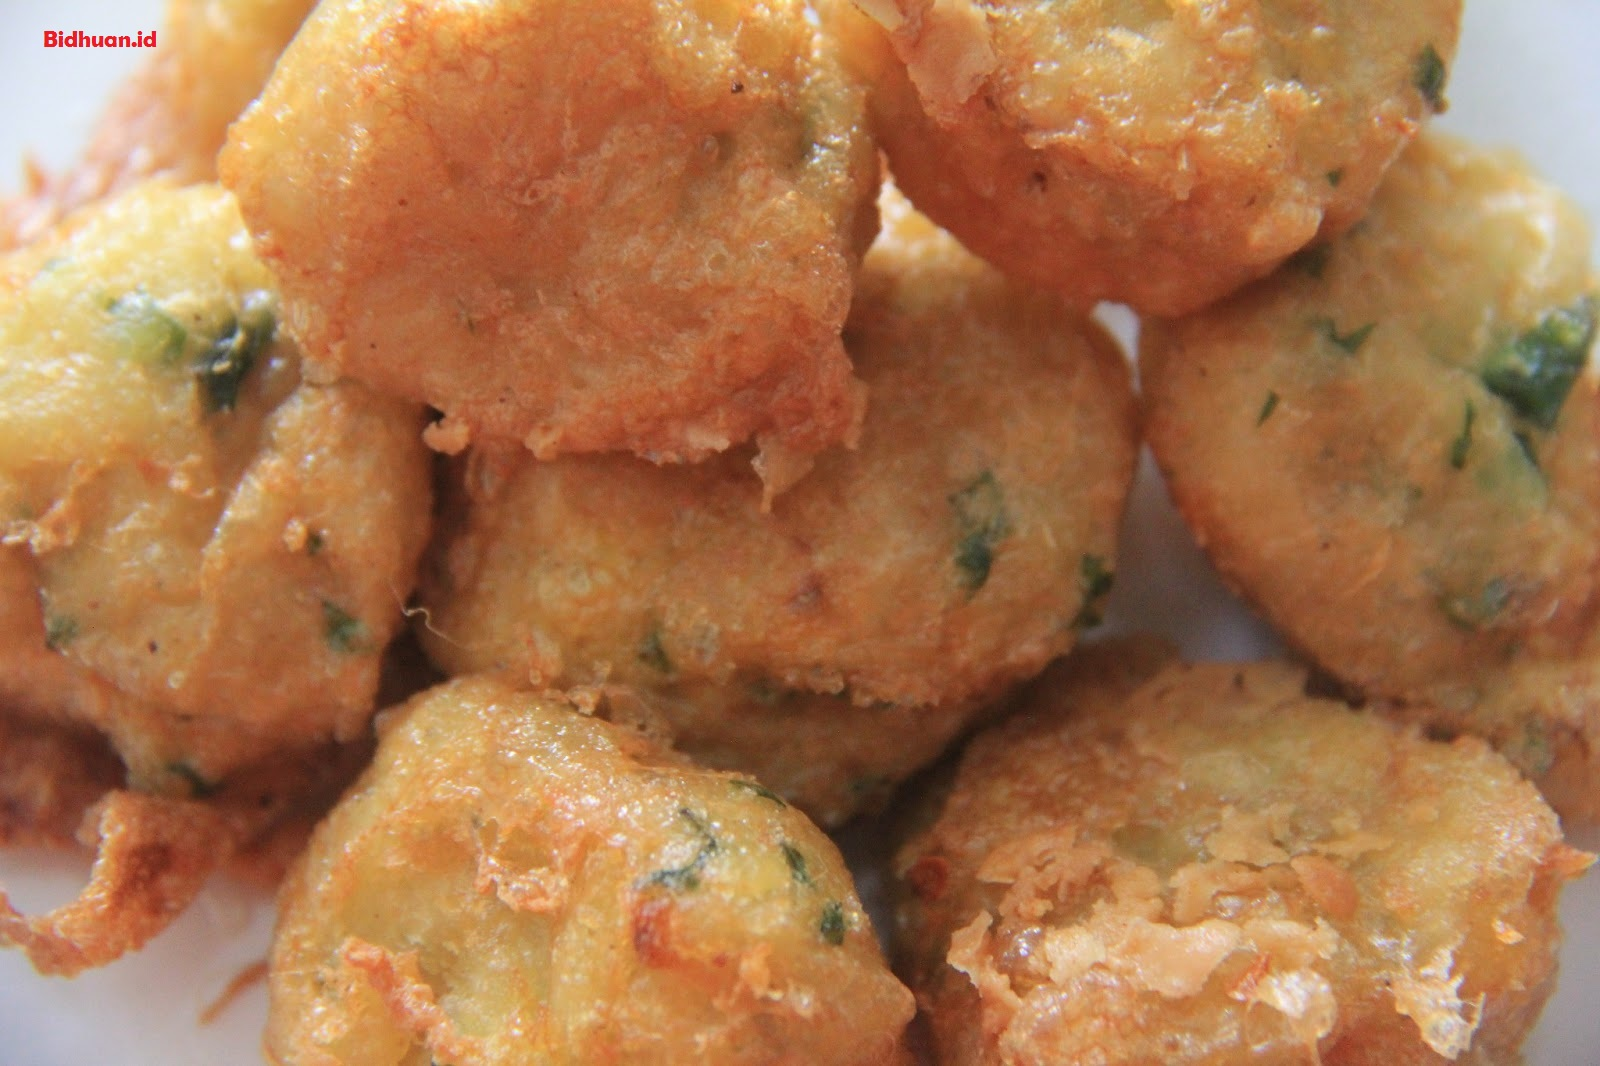 Resep perkedel kentang kukus